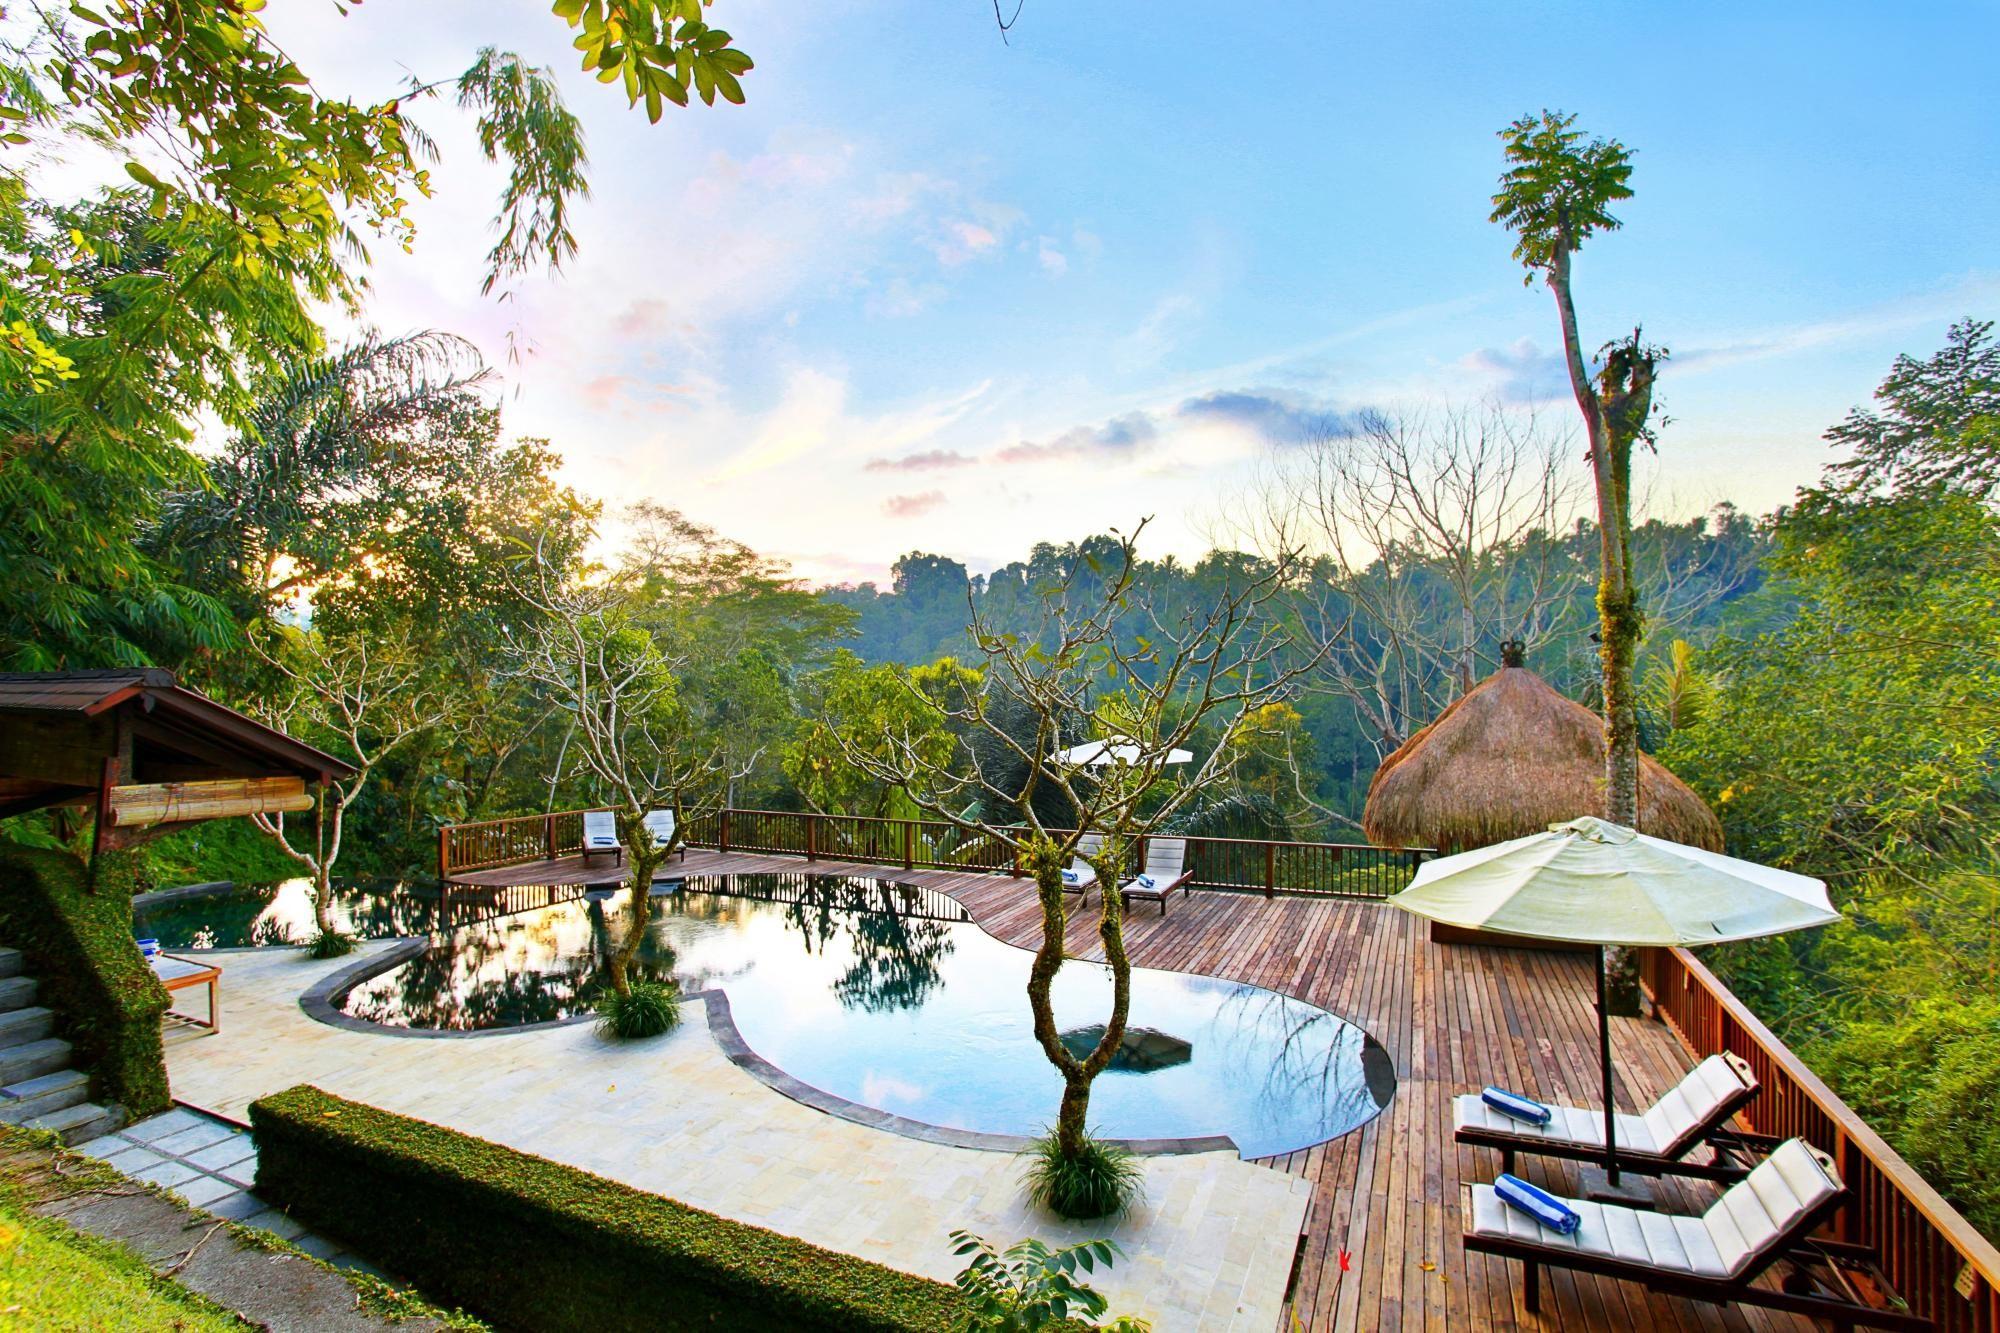 Nandini Bali Jungle Resort & Spa (Payangan) - Hotel Reviews, Photos & Price  Comparison - TripAdvisor